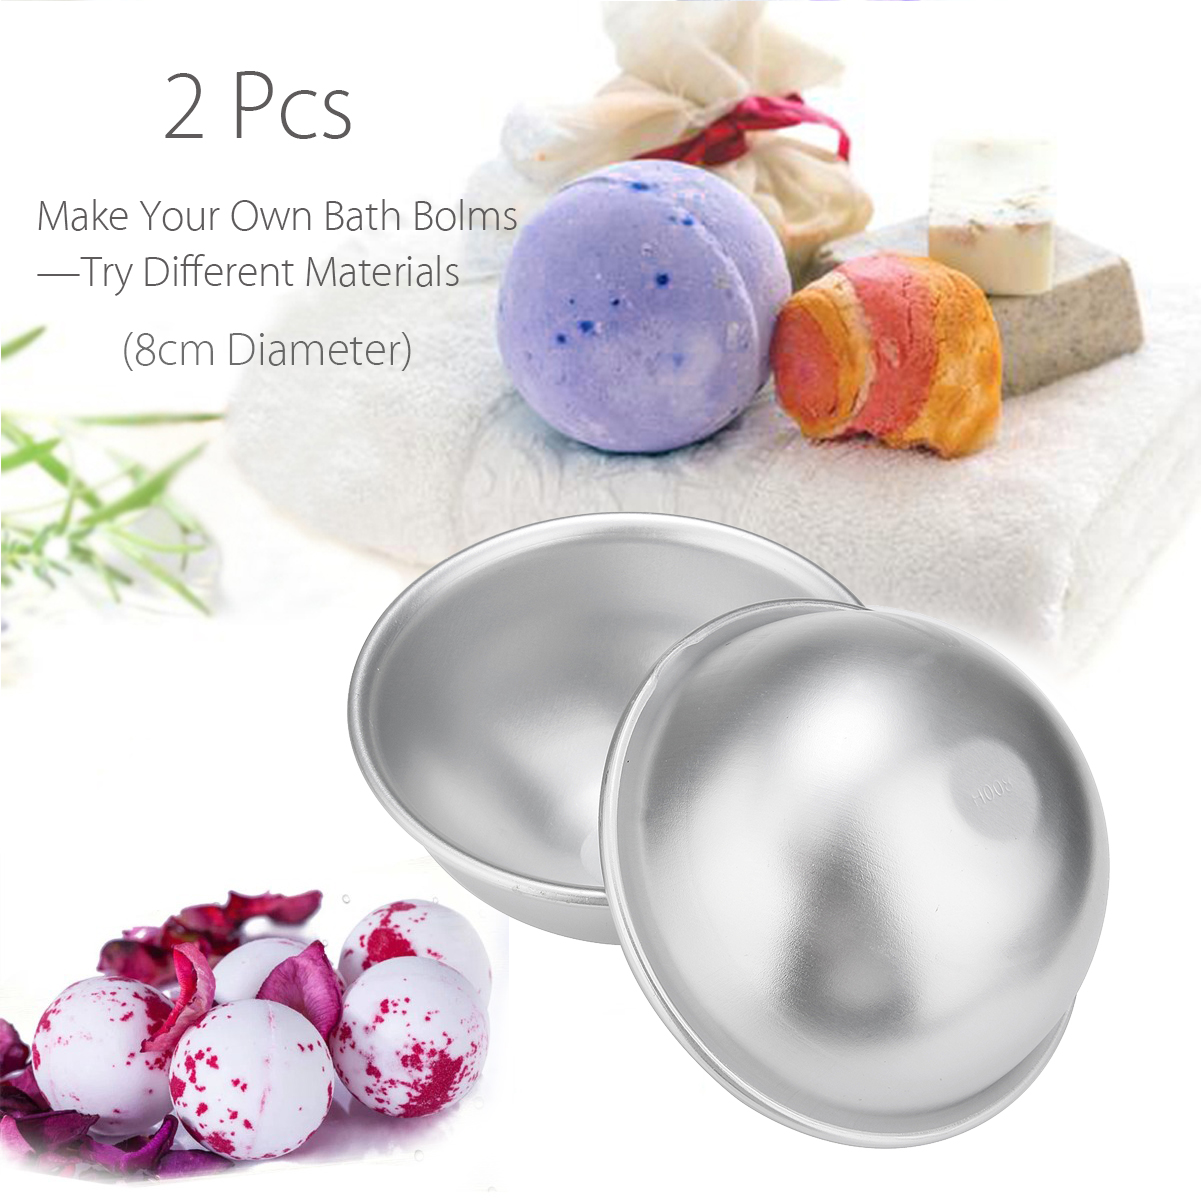 1 Pair 8cm 3D Metal Ball Sphere Shape Bath Bomb Mold Bath Bomb Ball Maker Handmade Ball Mould Manual DIY Bathing Tool Accessorie